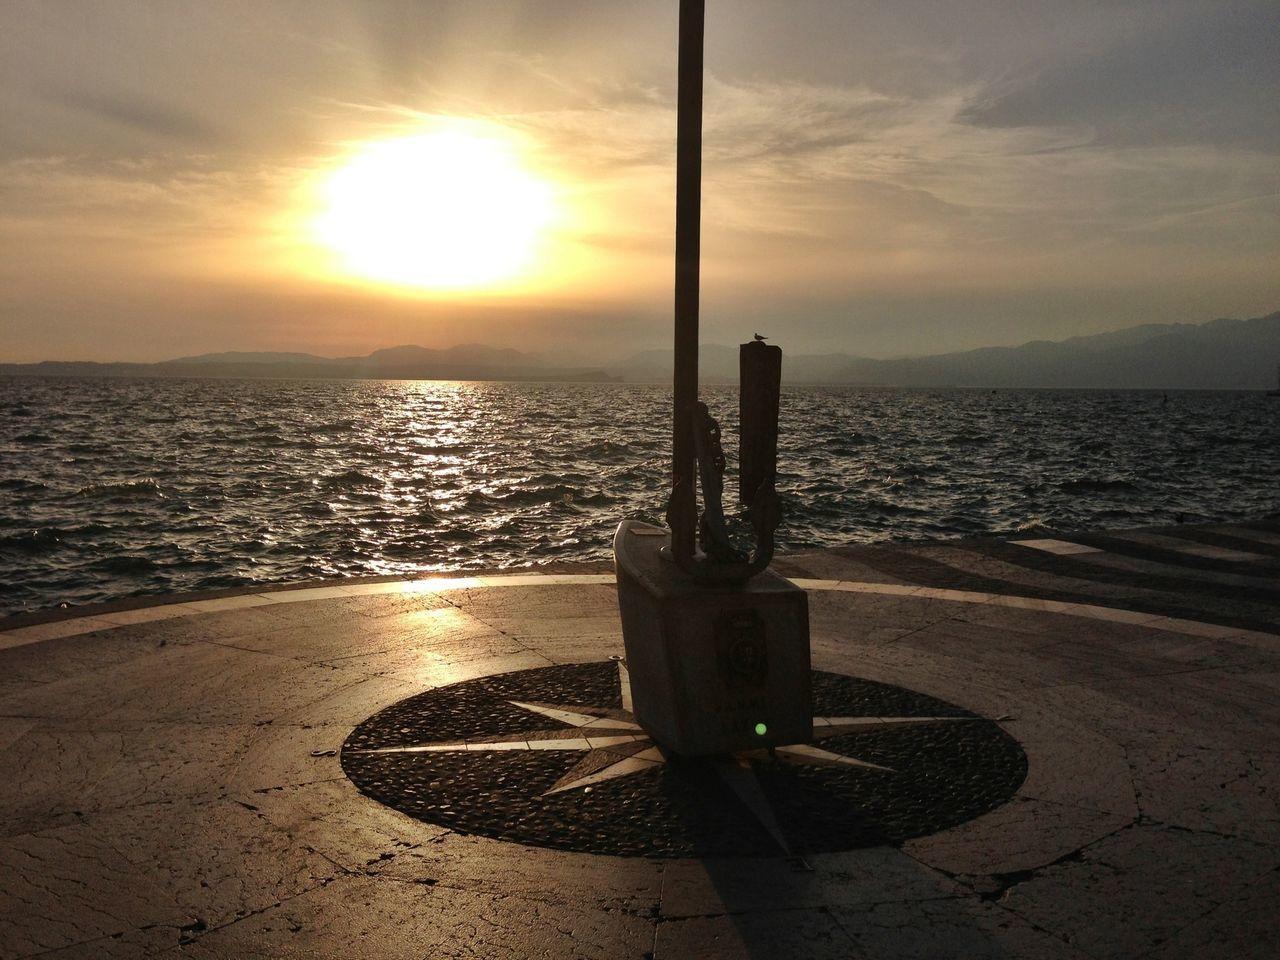 Water_collection Water Lago Di Garda Sunset